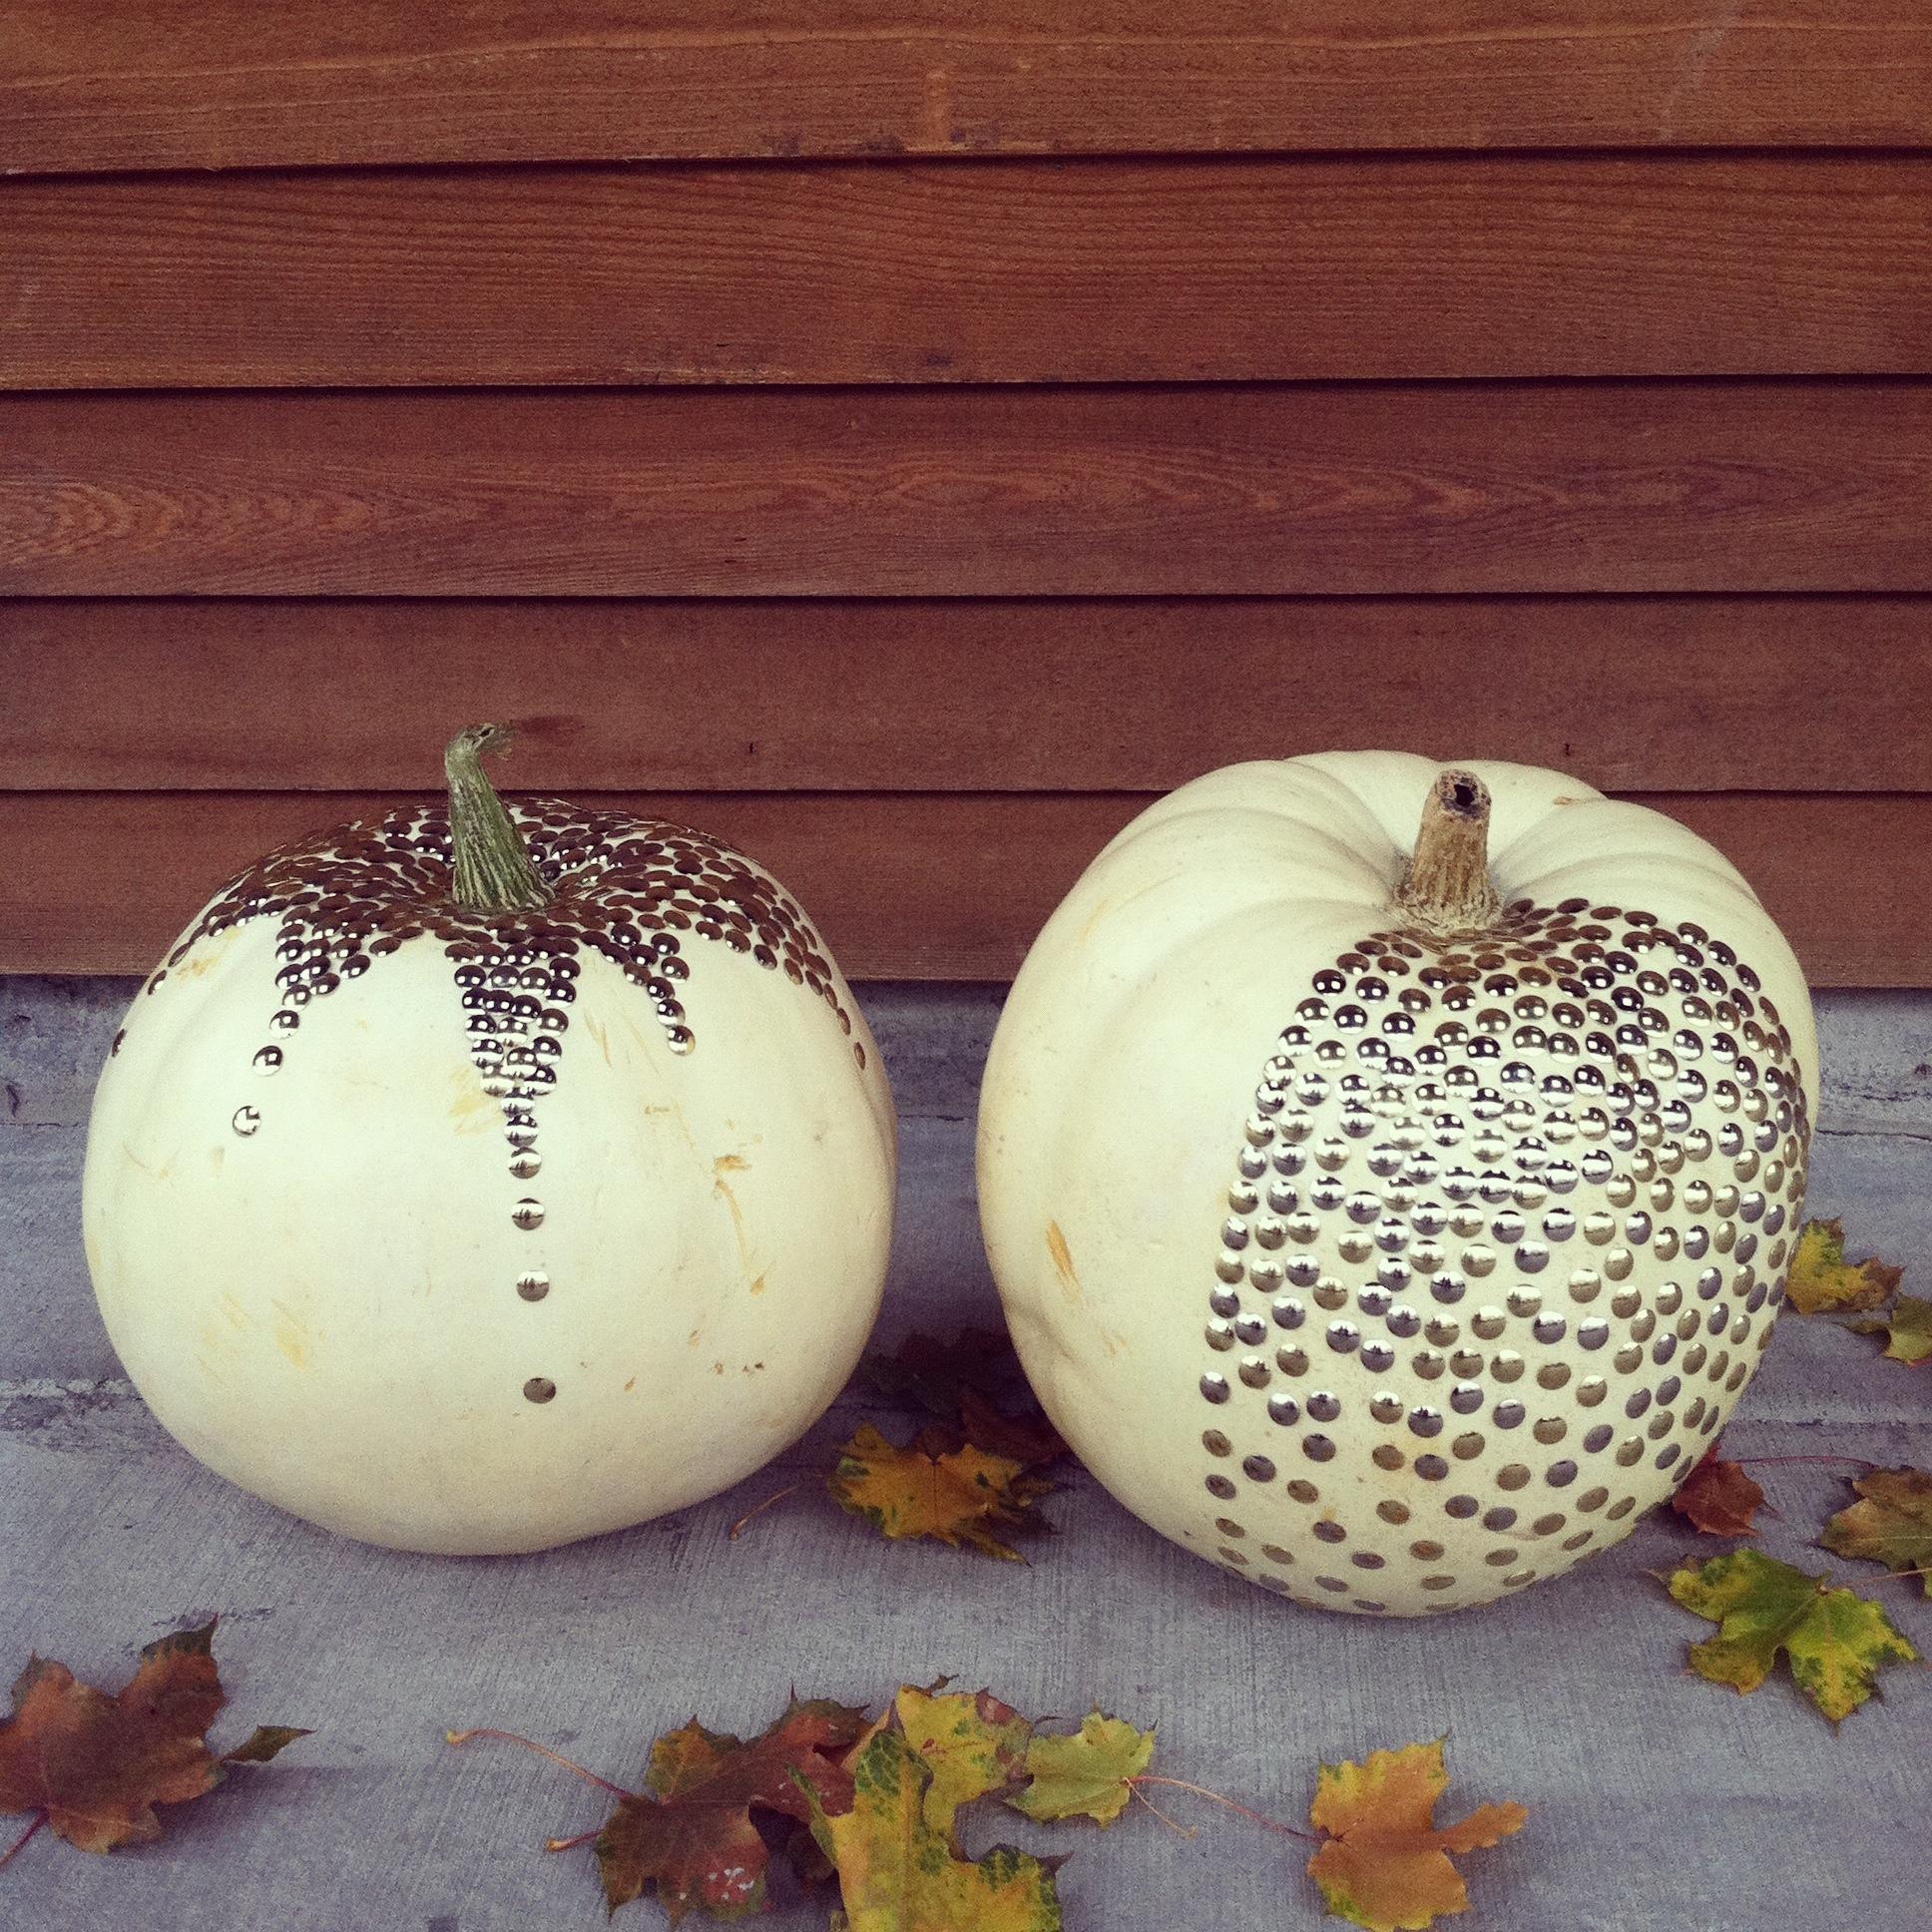 Drawn pumpkin thumbtack Take Push to Drab Ideas